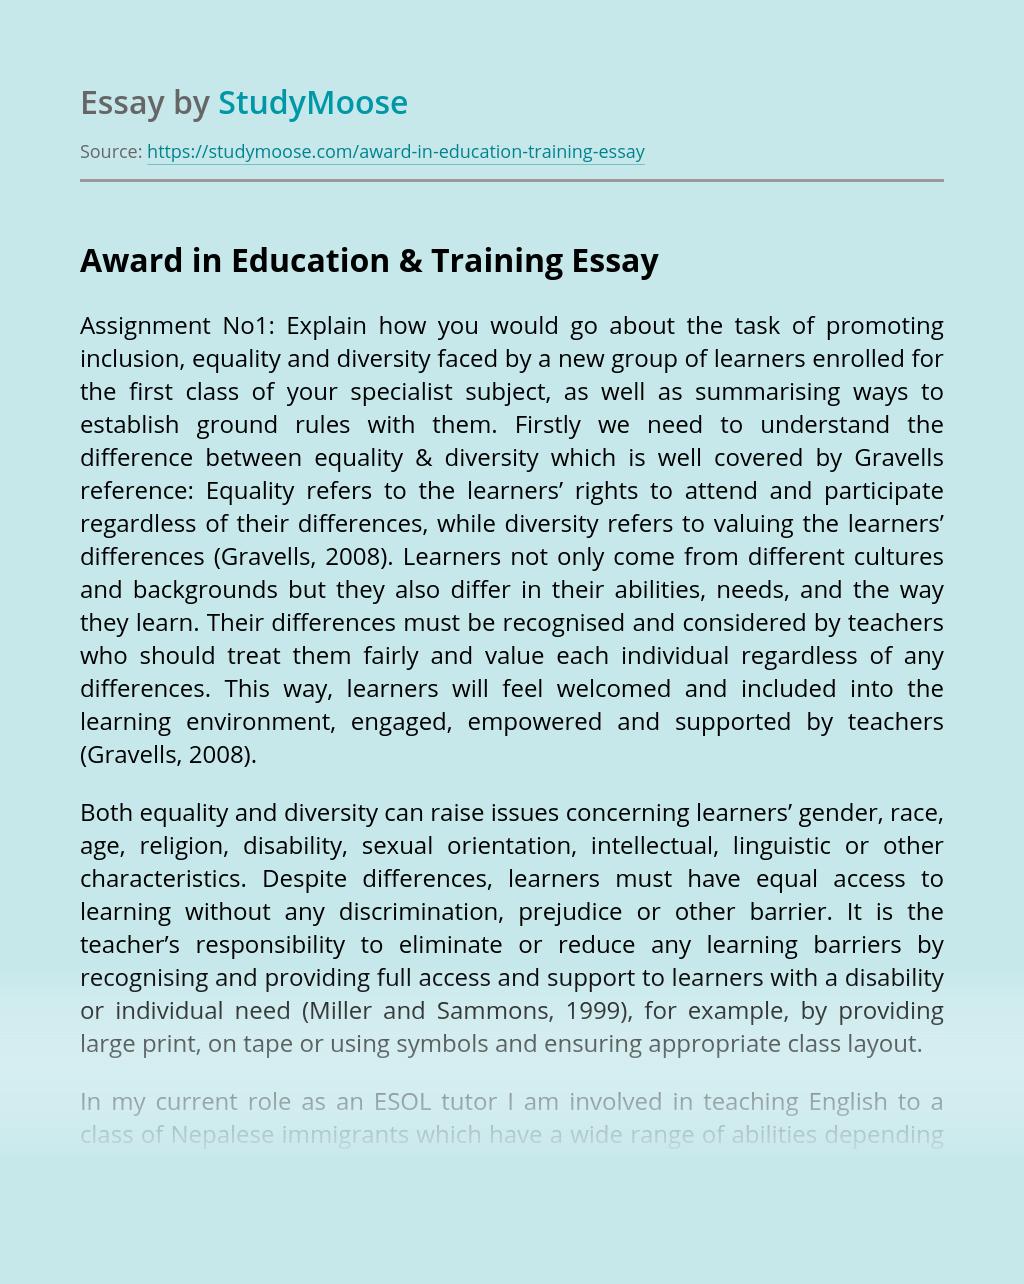 Award in Education & Training